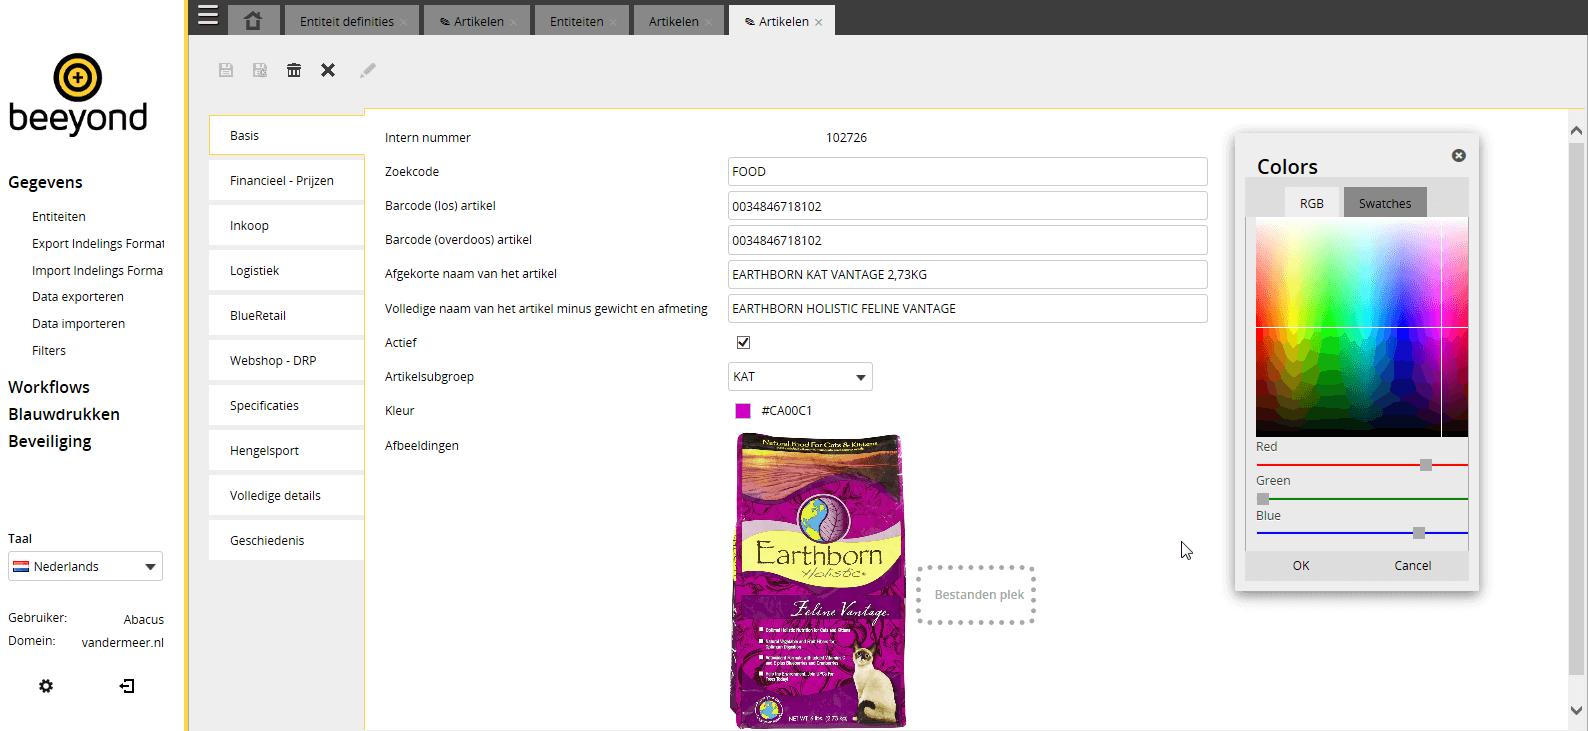 kleur opslaan in datasysteem